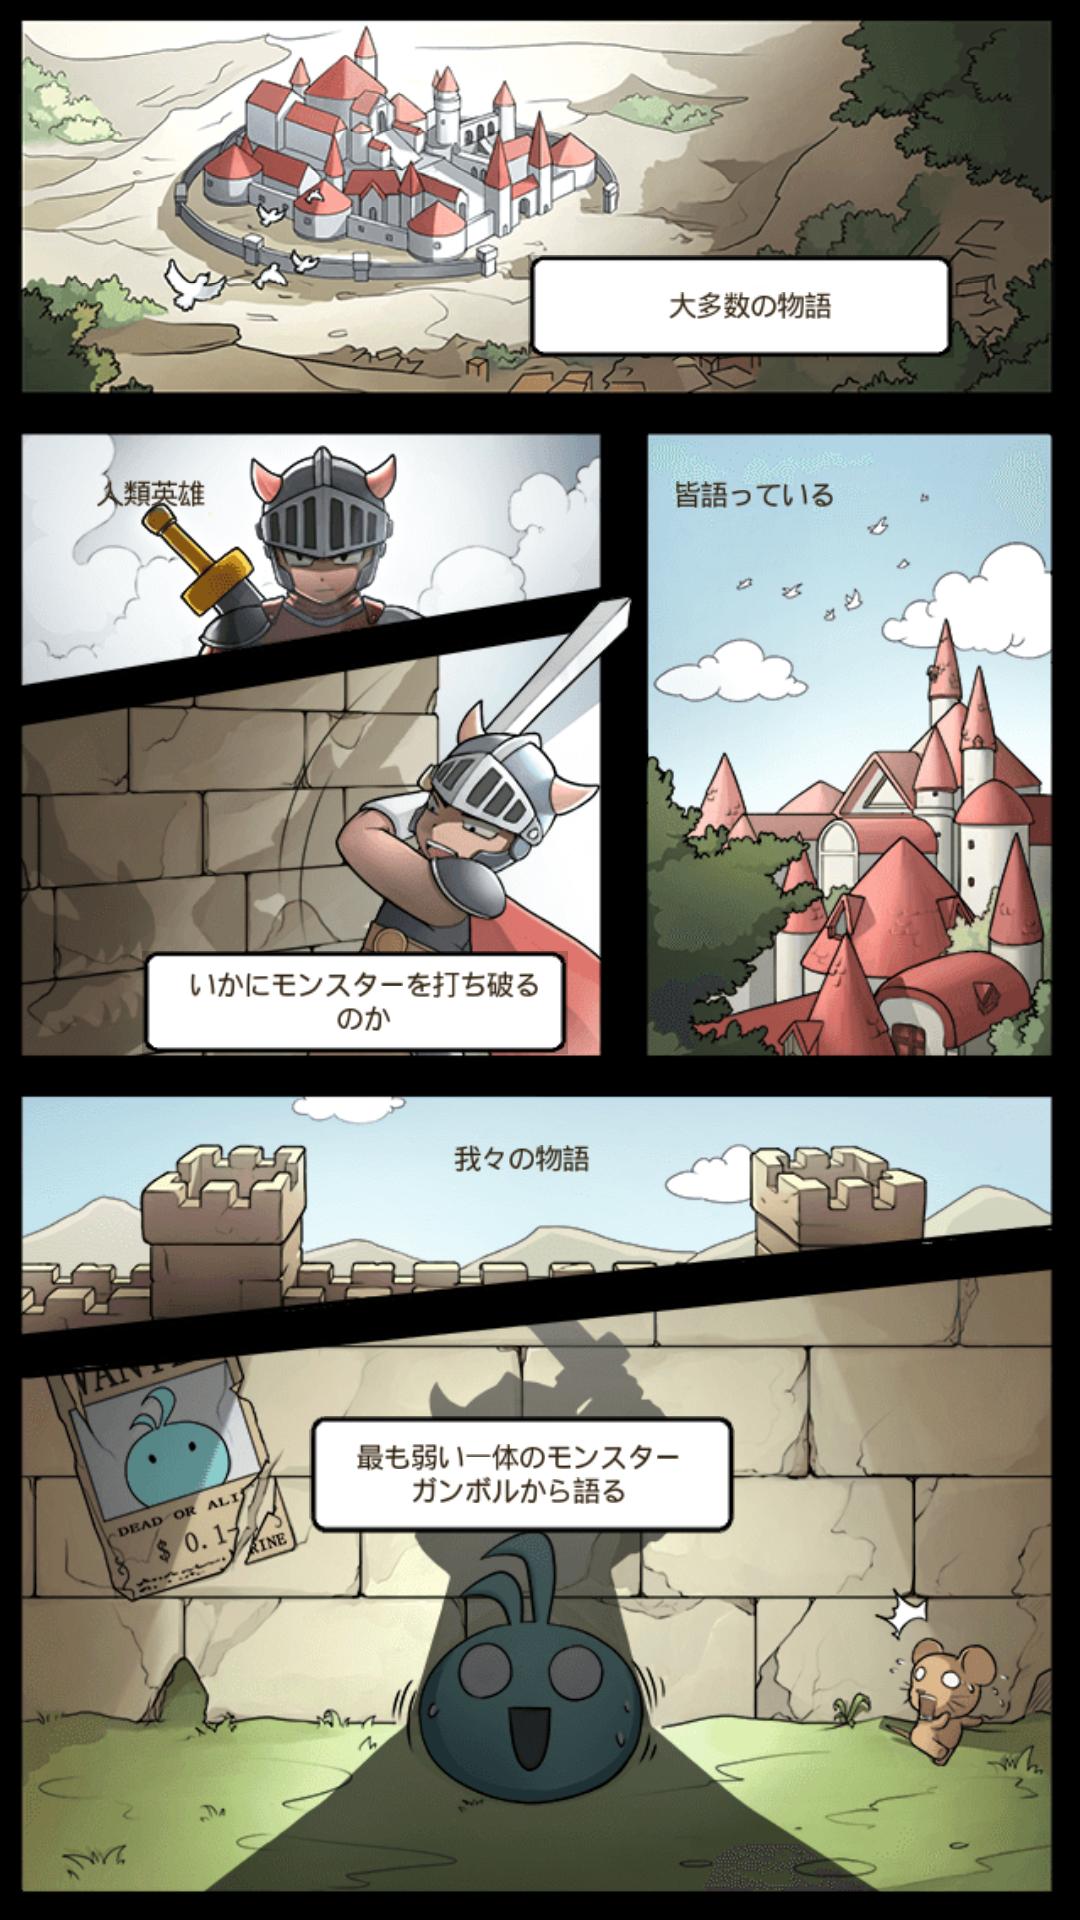 androidアプリ ダンジョンズ&ガンボル(Gumballs & Dungeons)攻略スクリーンショット1